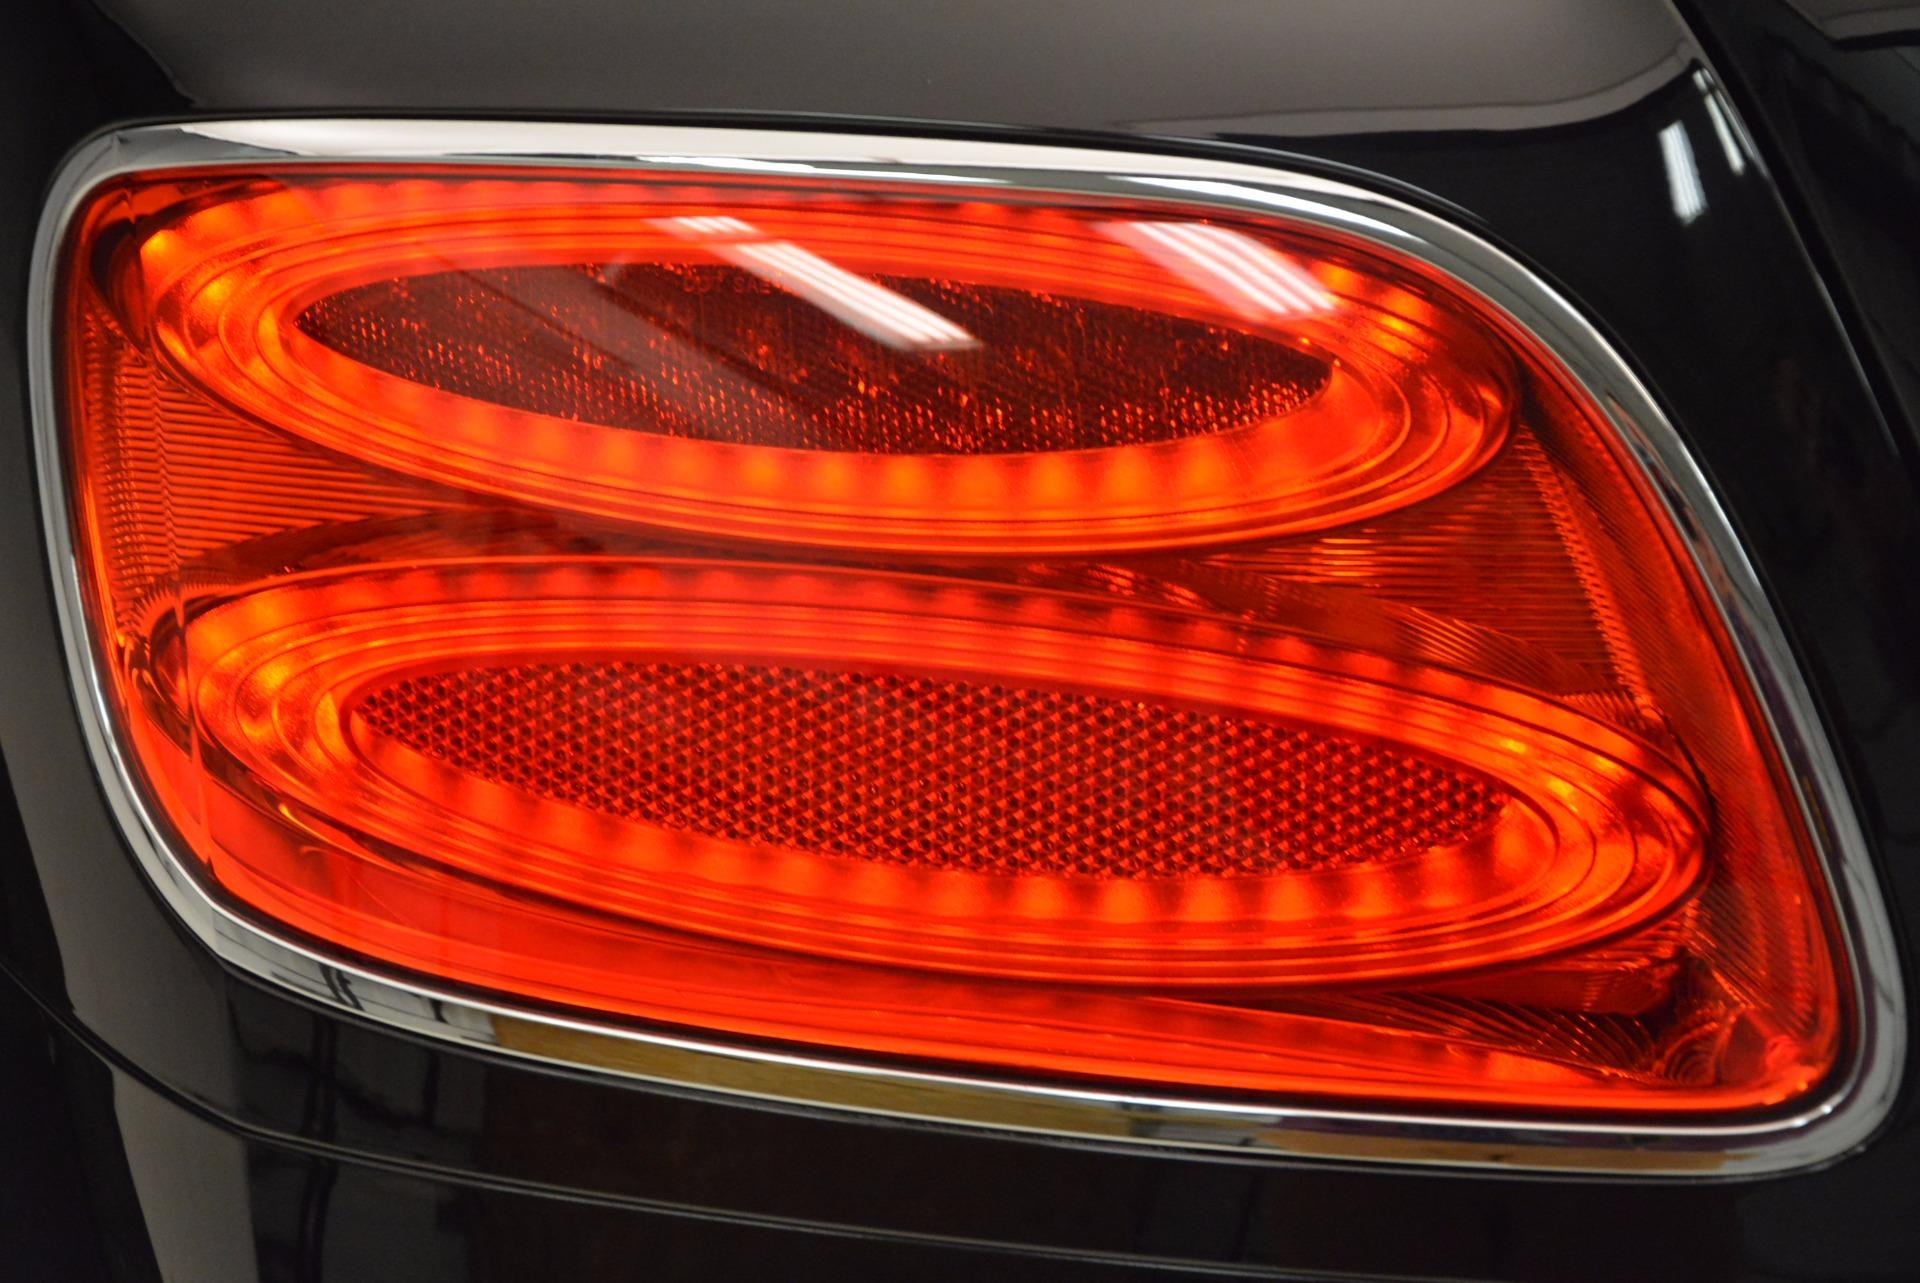 Used 2015 Bentley Continental GT Speed For Sale In Westport, CT 1646_p37